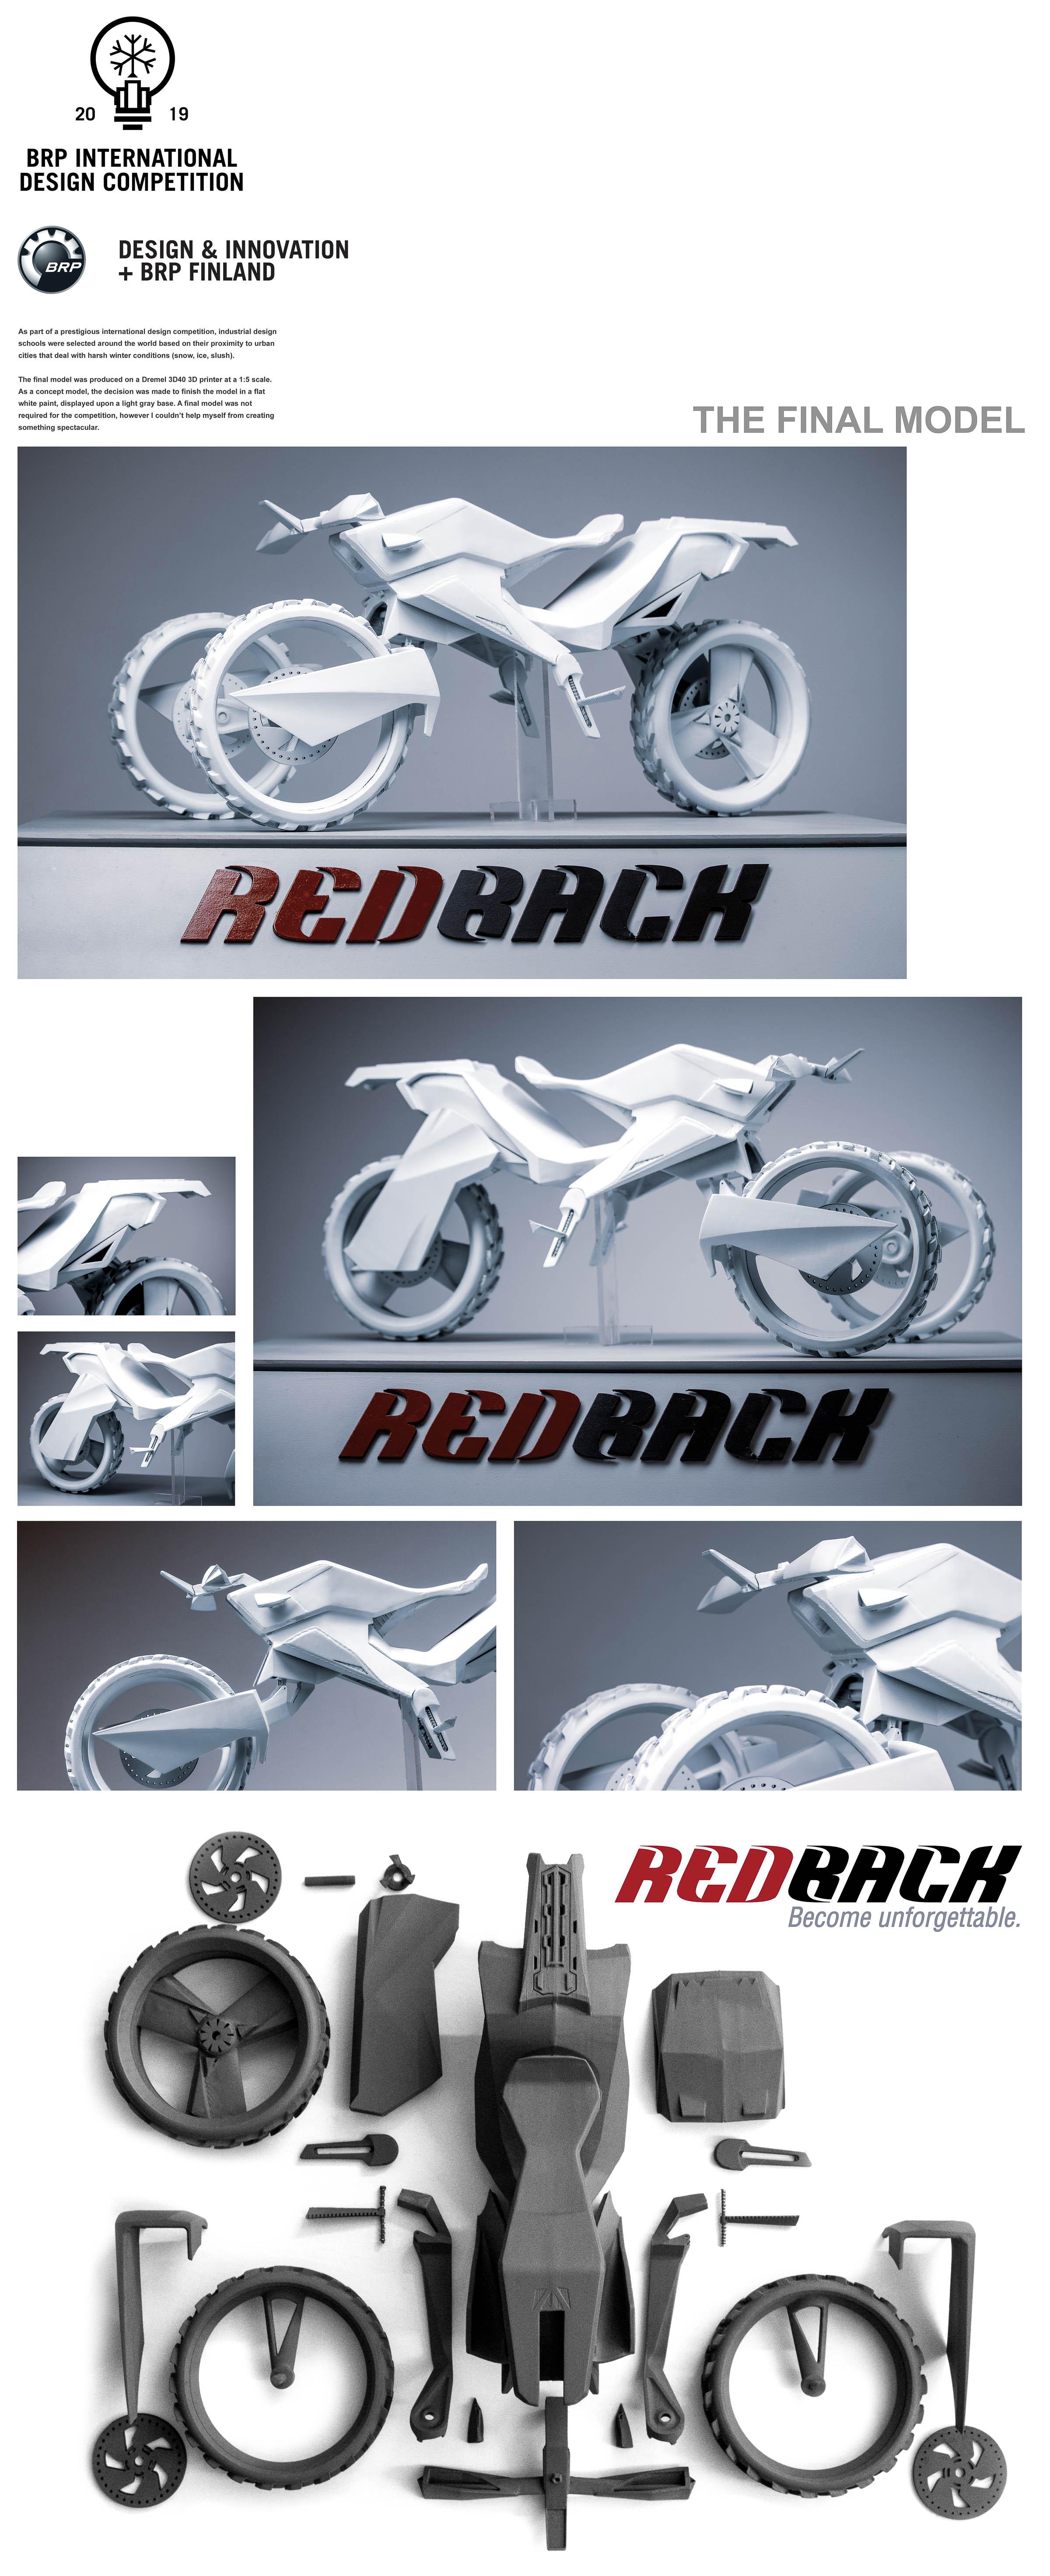 REDBACK_BRP_INDUSTRIAL_DESIGN_